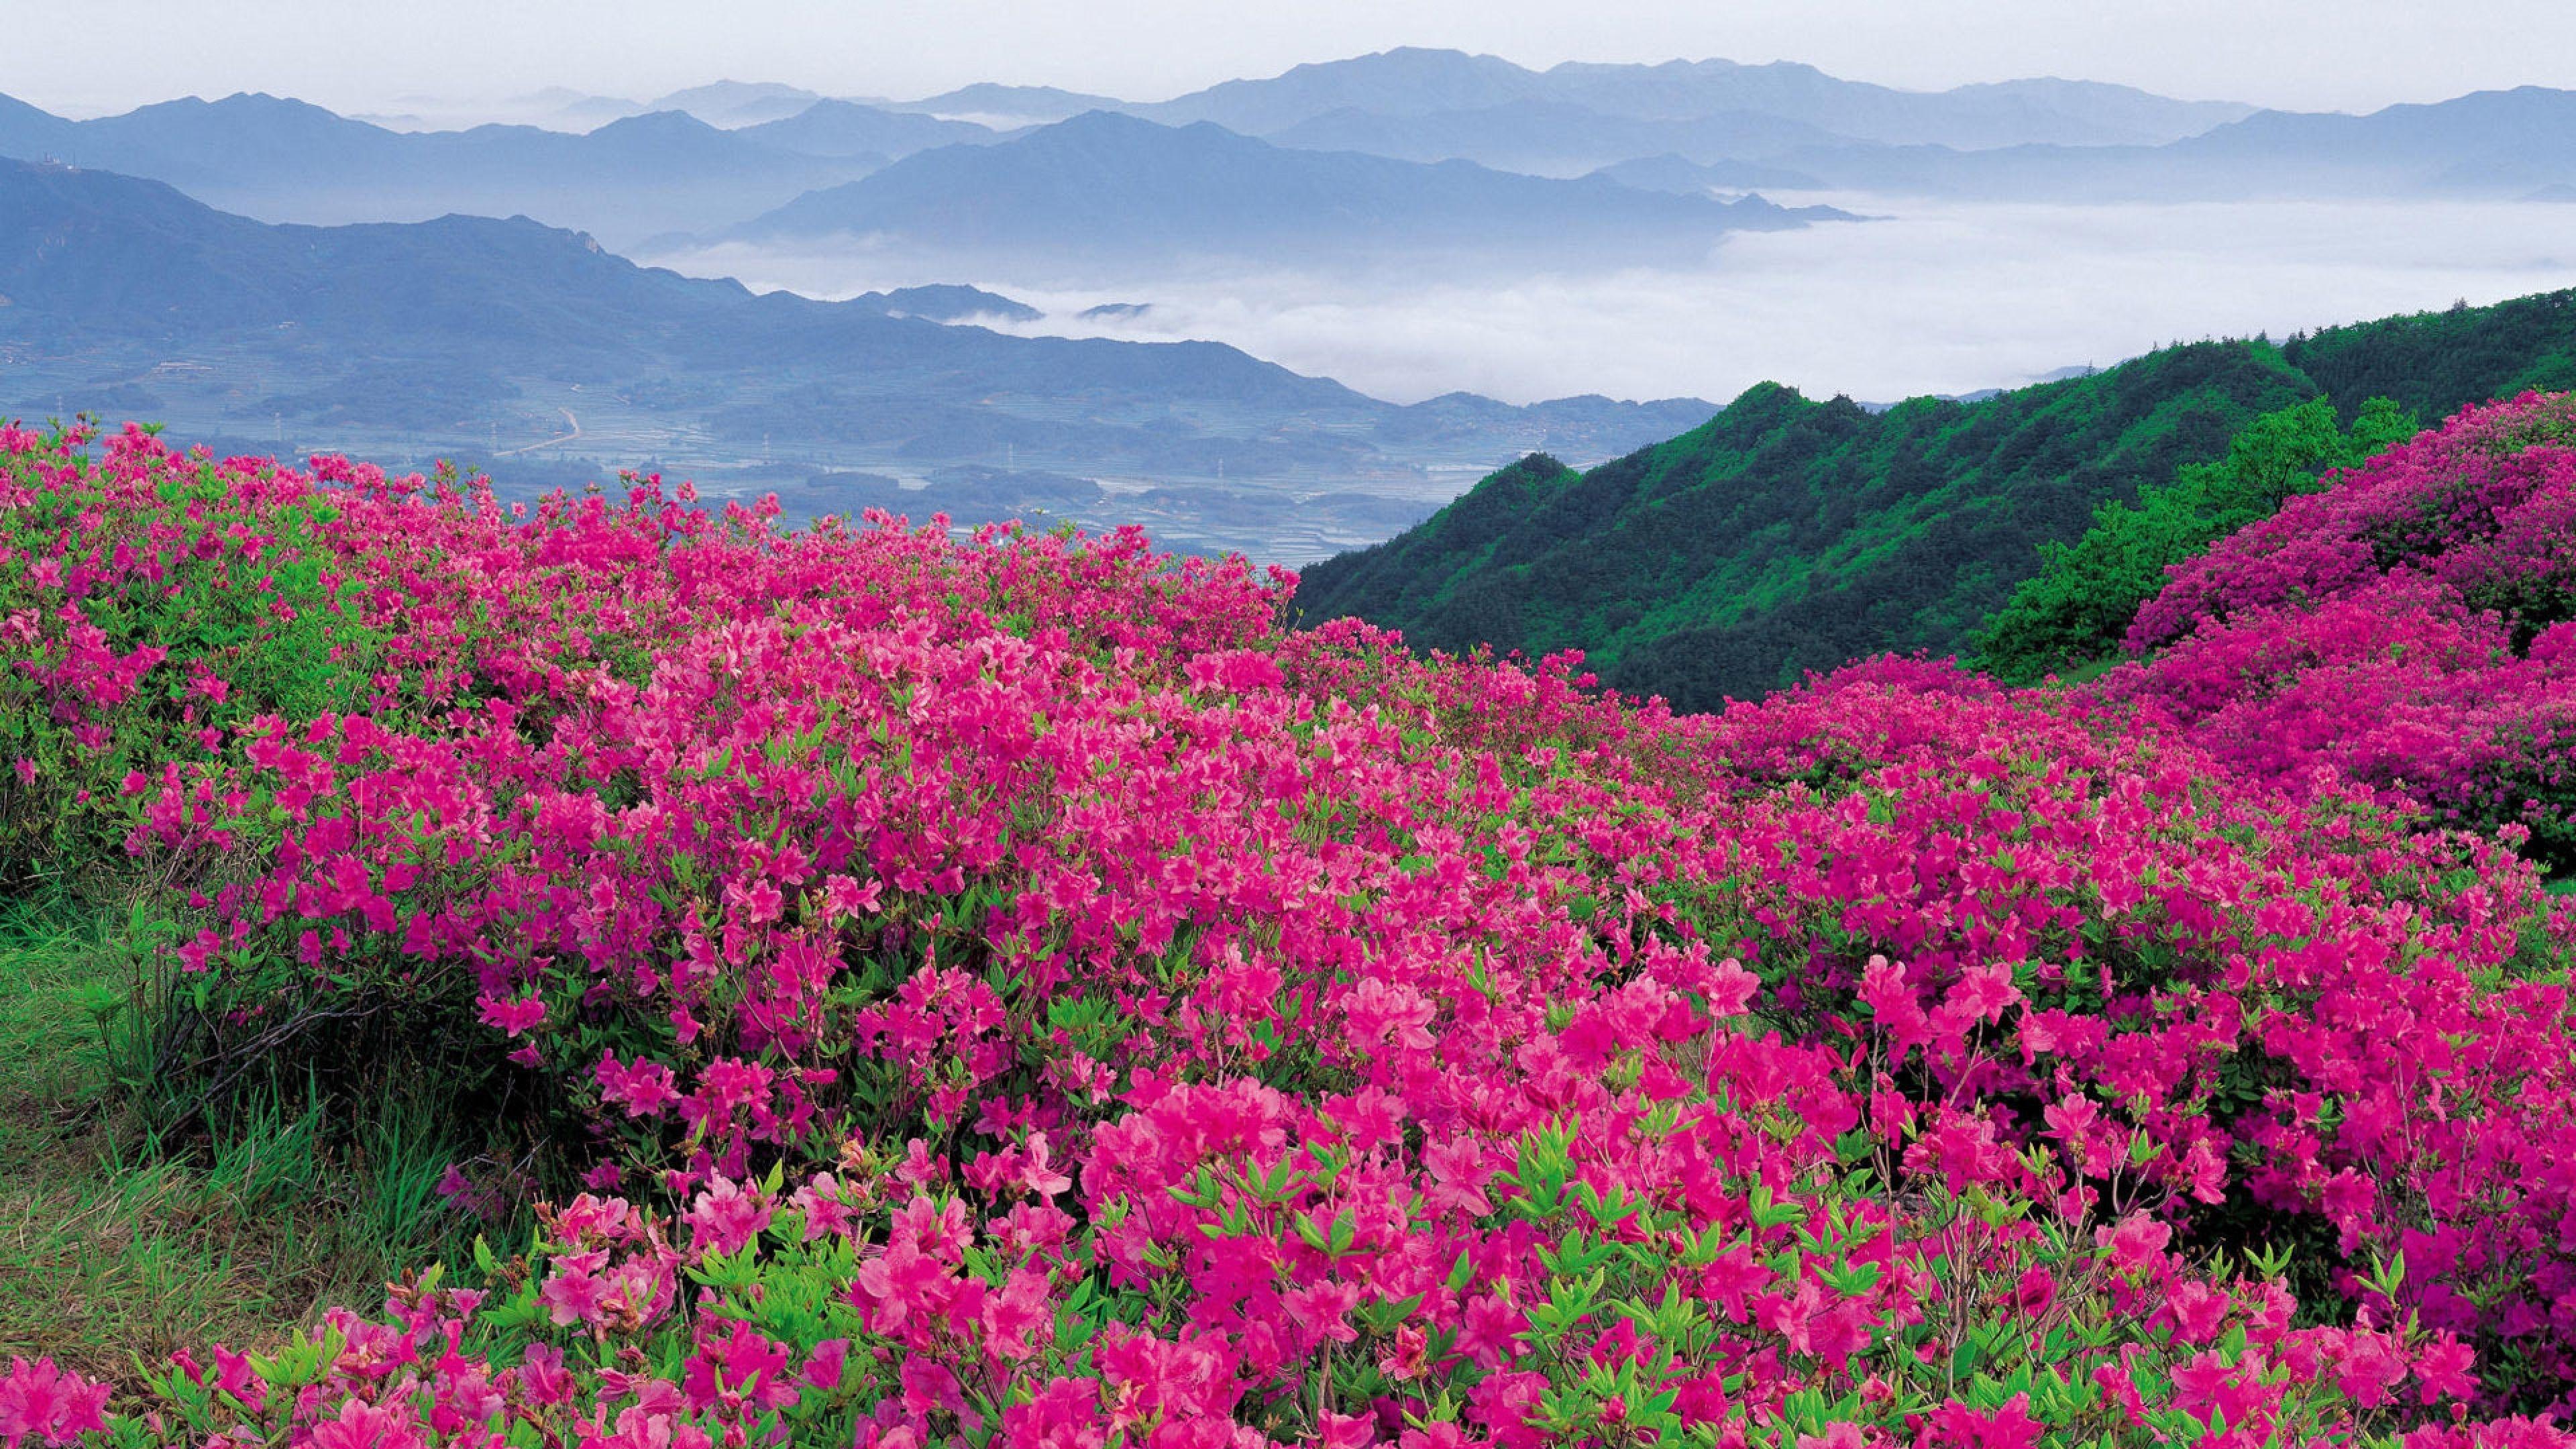 flowers 4K Ultra HD Wallpaper | ... Flowers, Mountains, Distance ...